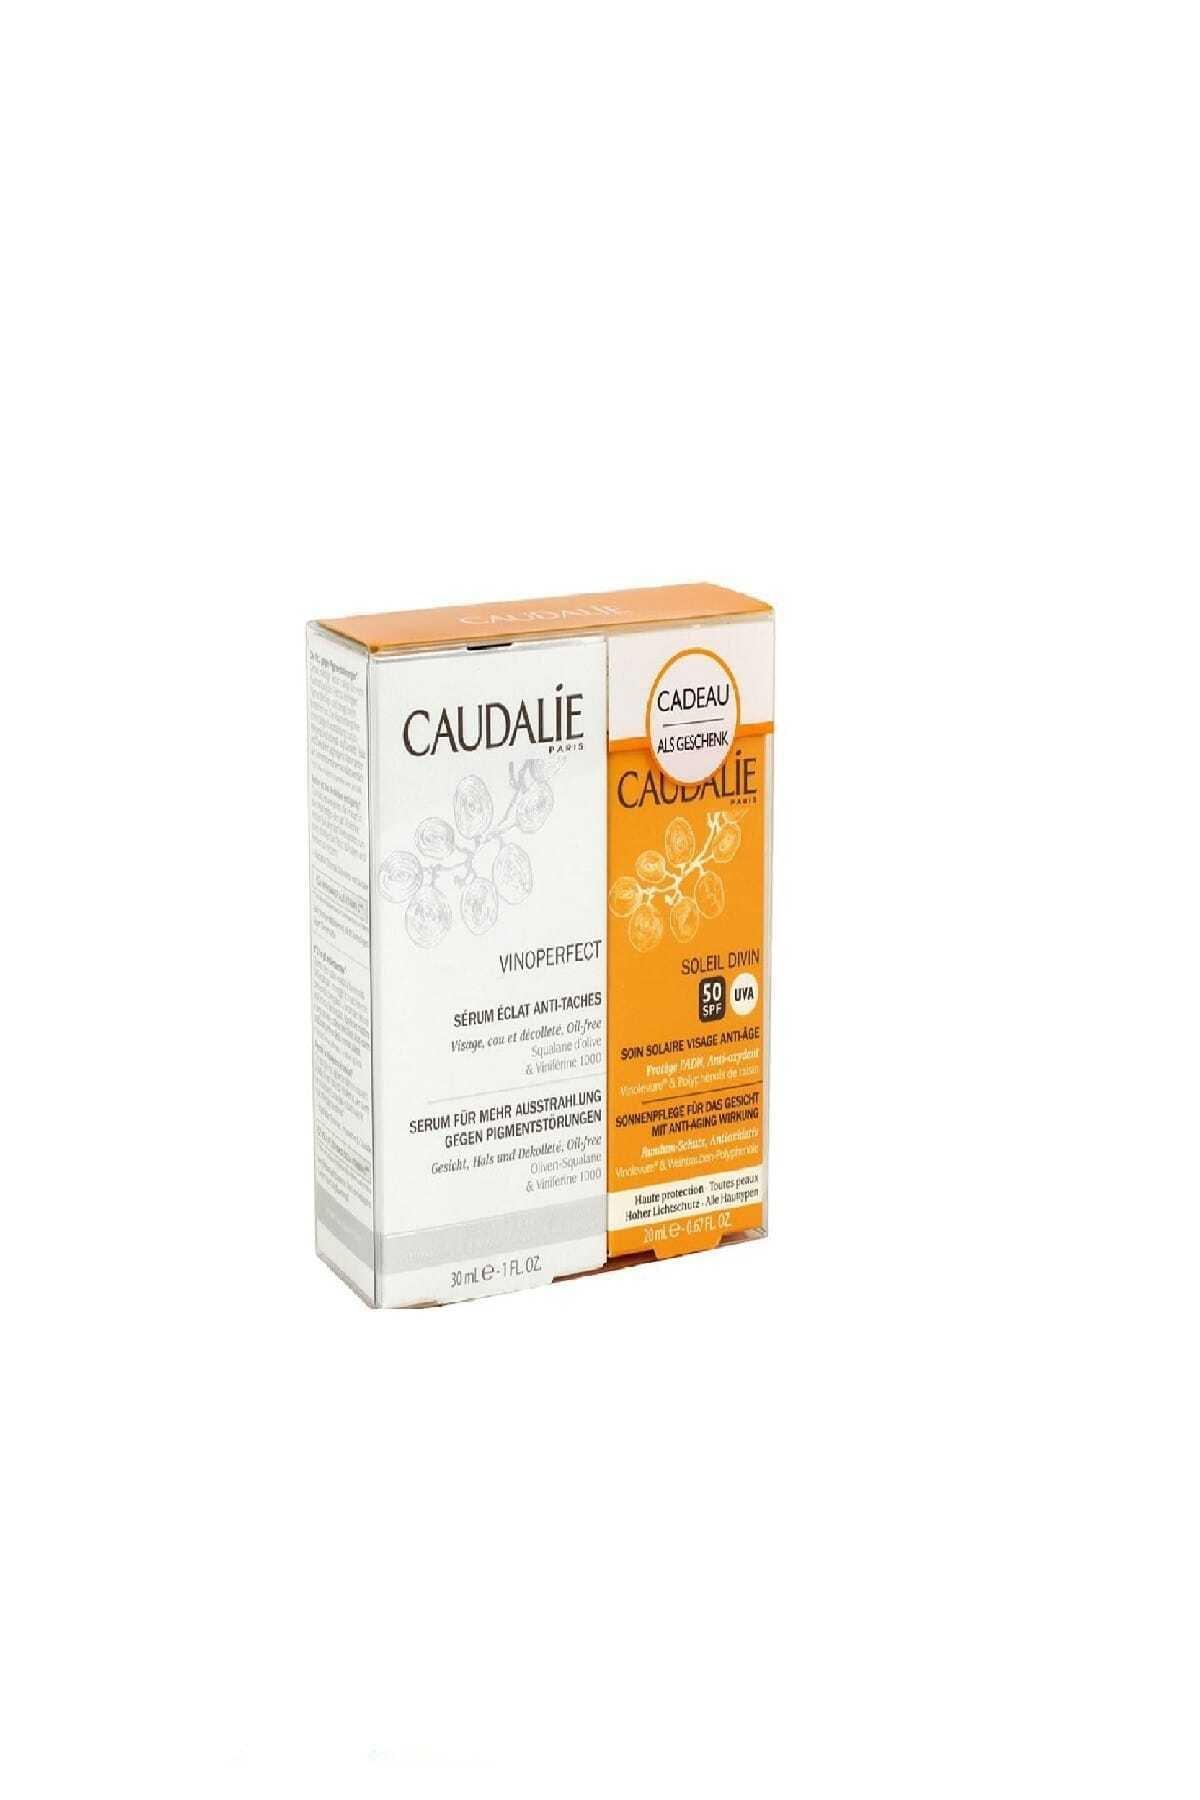 Vinoperfect Radiance Serum 30 ml & Cremem Solaire SPF50 25 ml 3522930023296